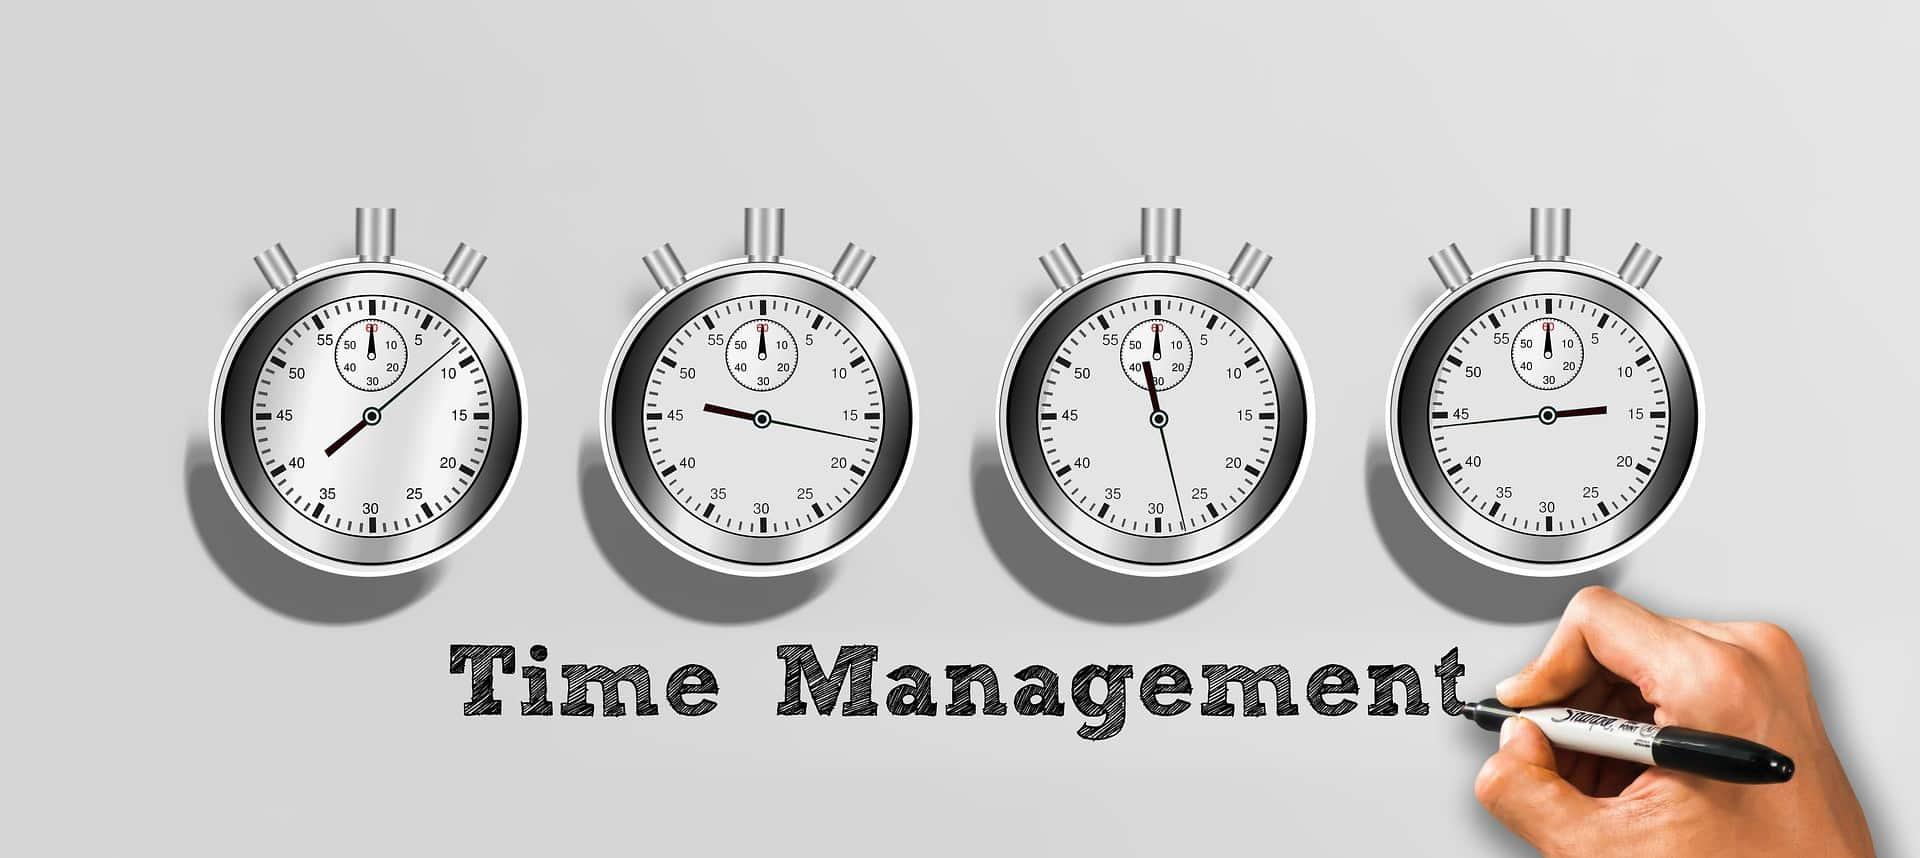 Six Time Management Tips For Entrepreneurs